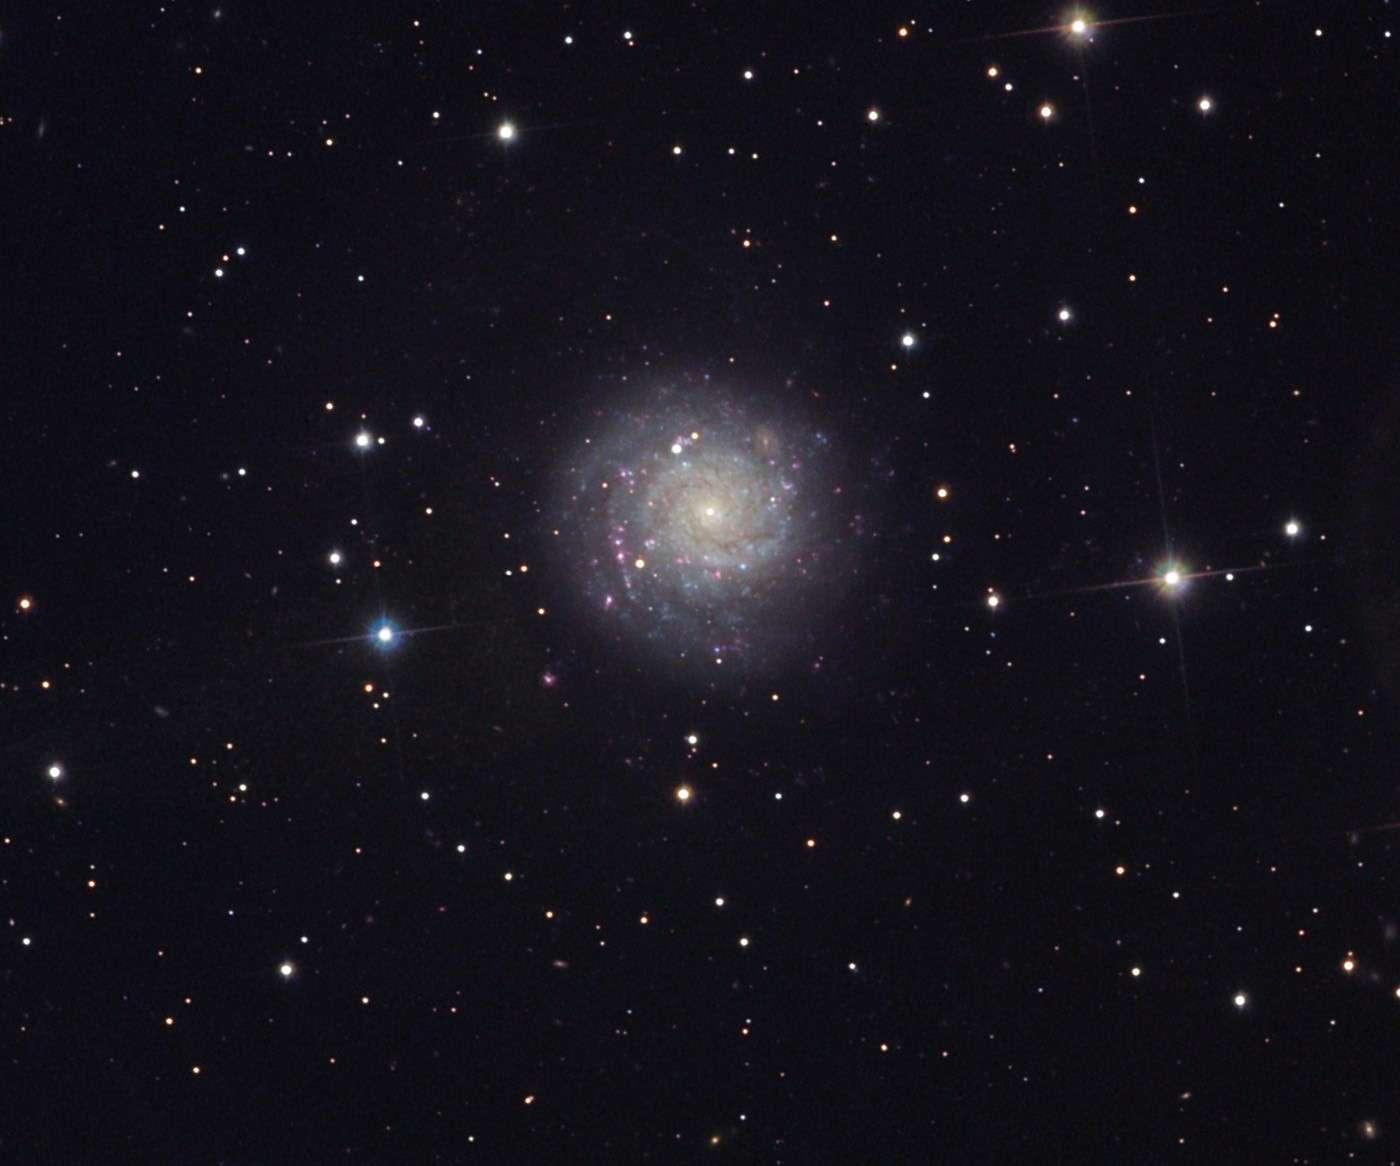 La galaxie NGC 1058, dans la constellation de Persée, abrite SN 1961V. © Bob Ferguson et Richard Desruisseau/Adam Block/NOAO/AURA/NSF